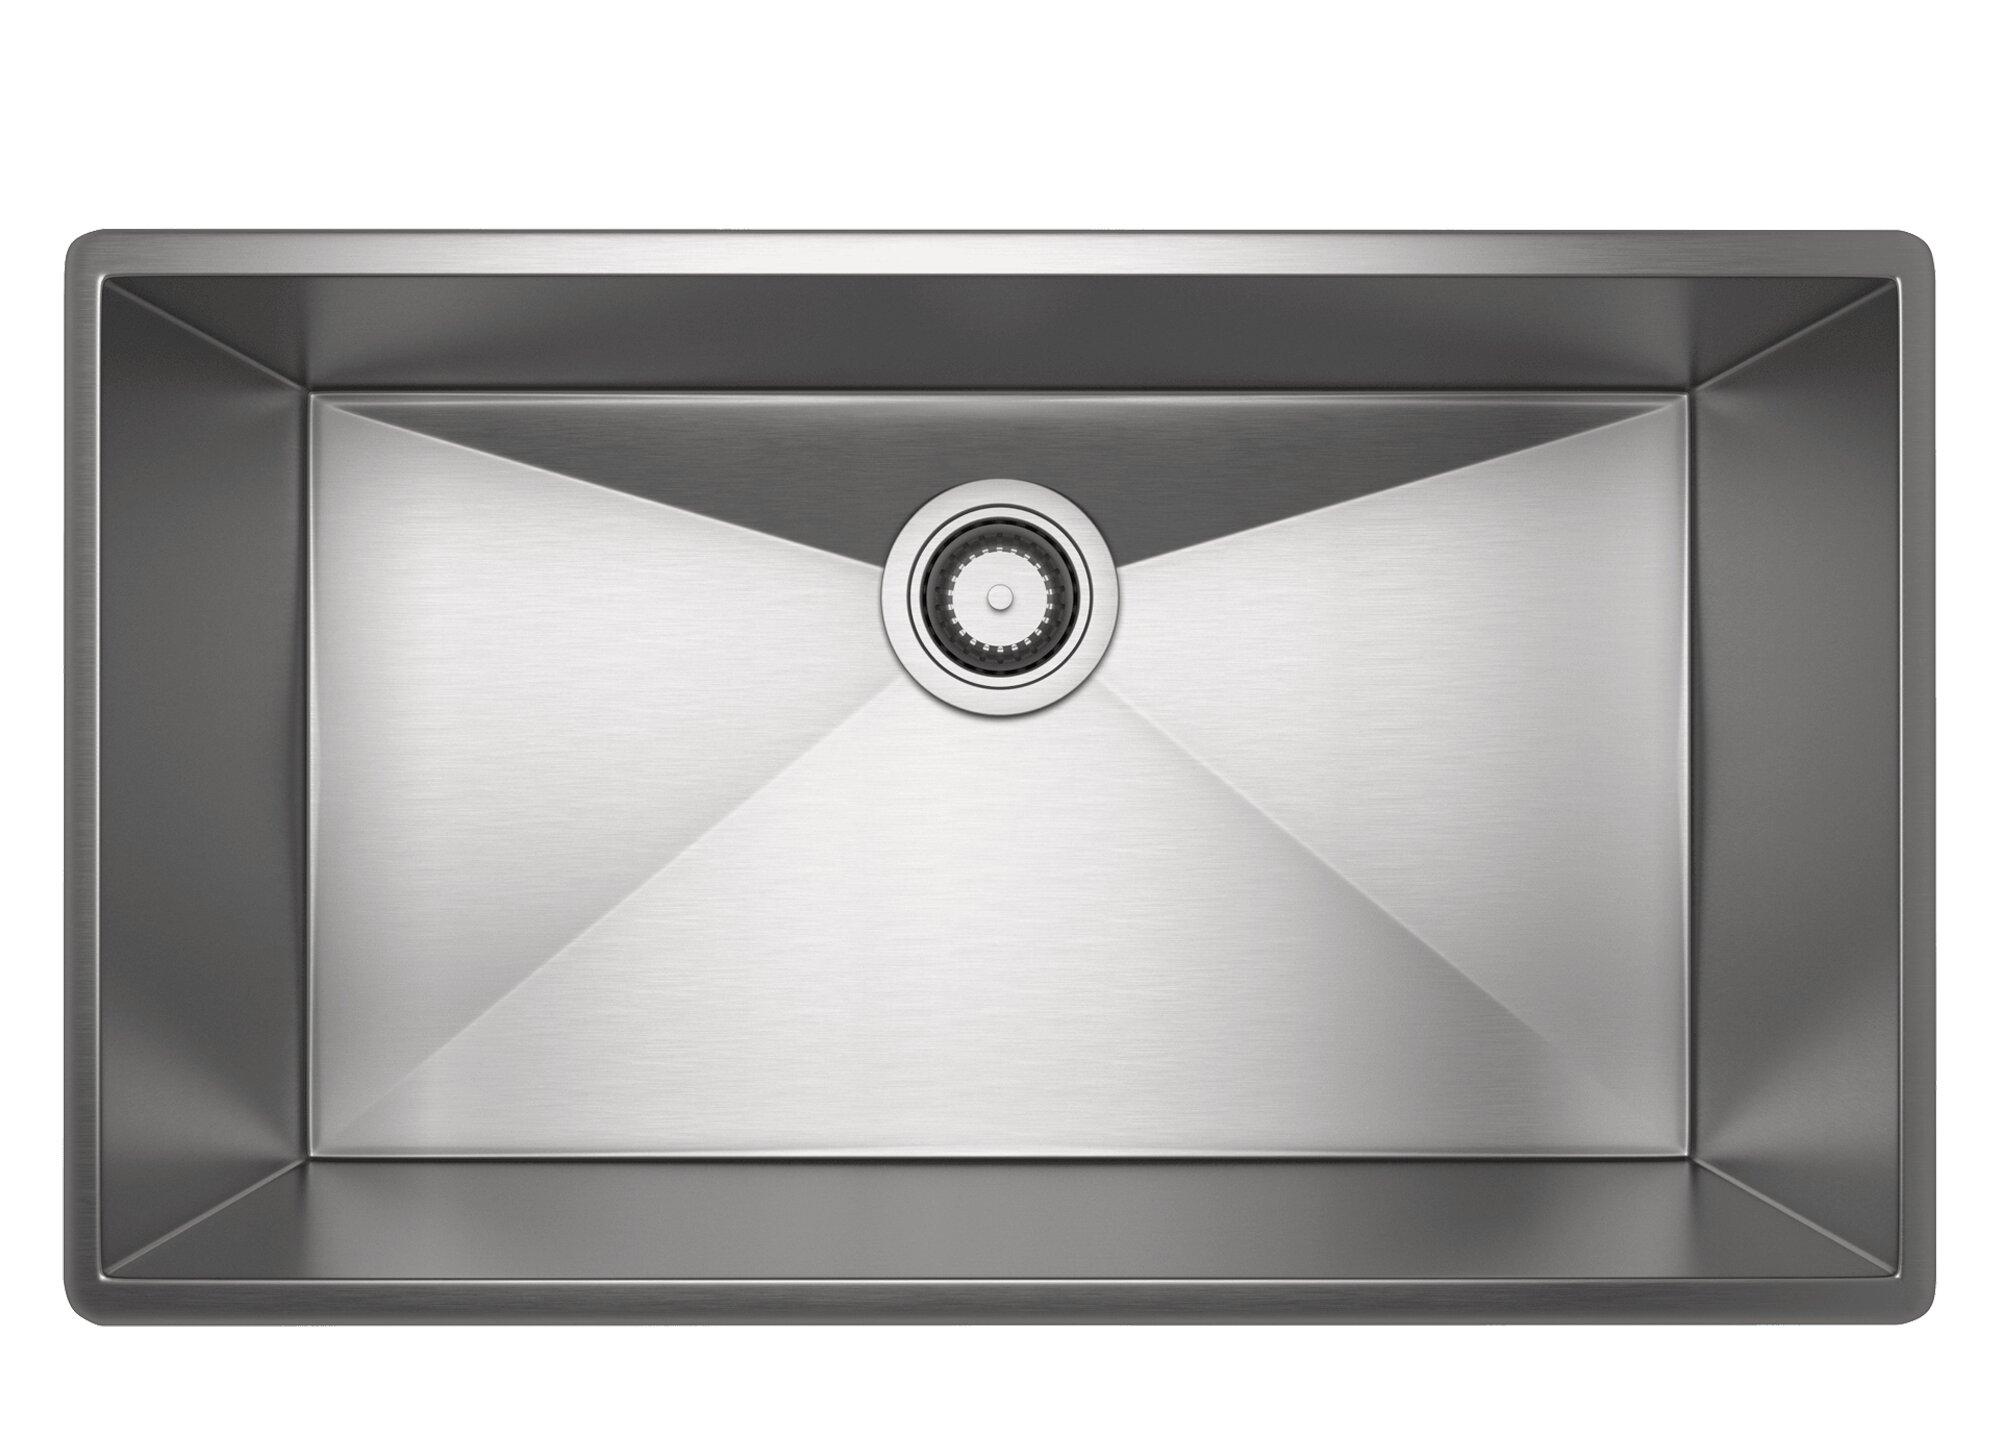 Rohl Forze 27 Single Bowl Stainless Steel Kitchen Sink Wayfair